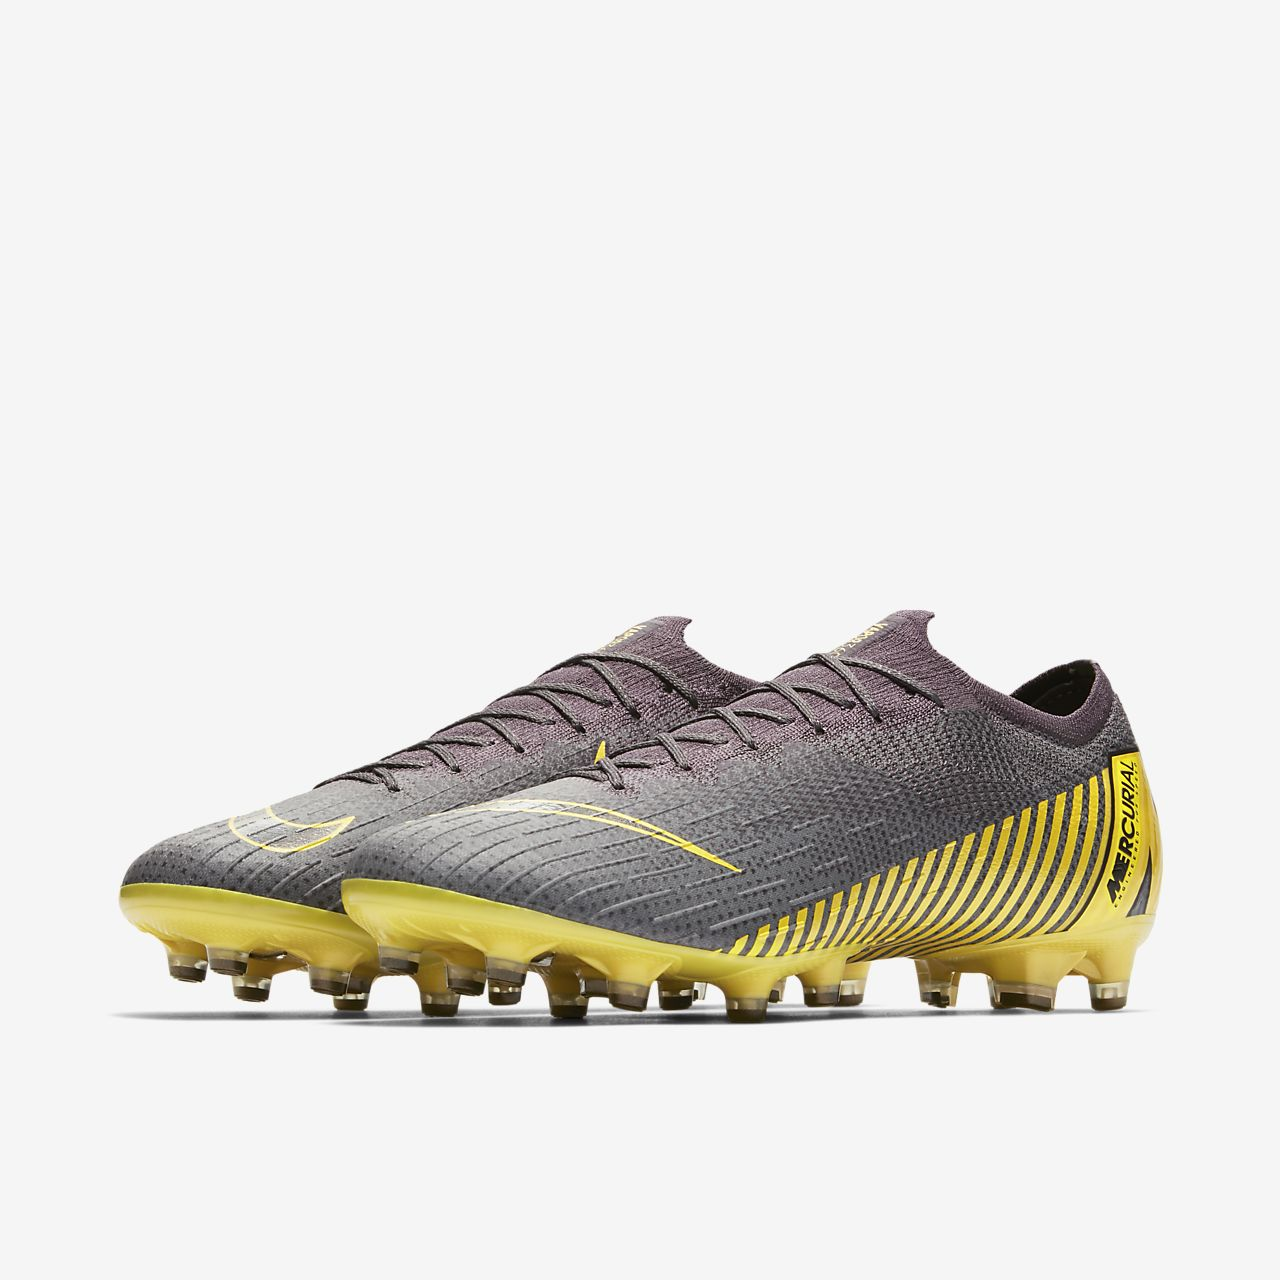 1393a8600 Nike Mercurial Vapor 360 Elite AG-PRO Artificial-Grass Football Boot ...